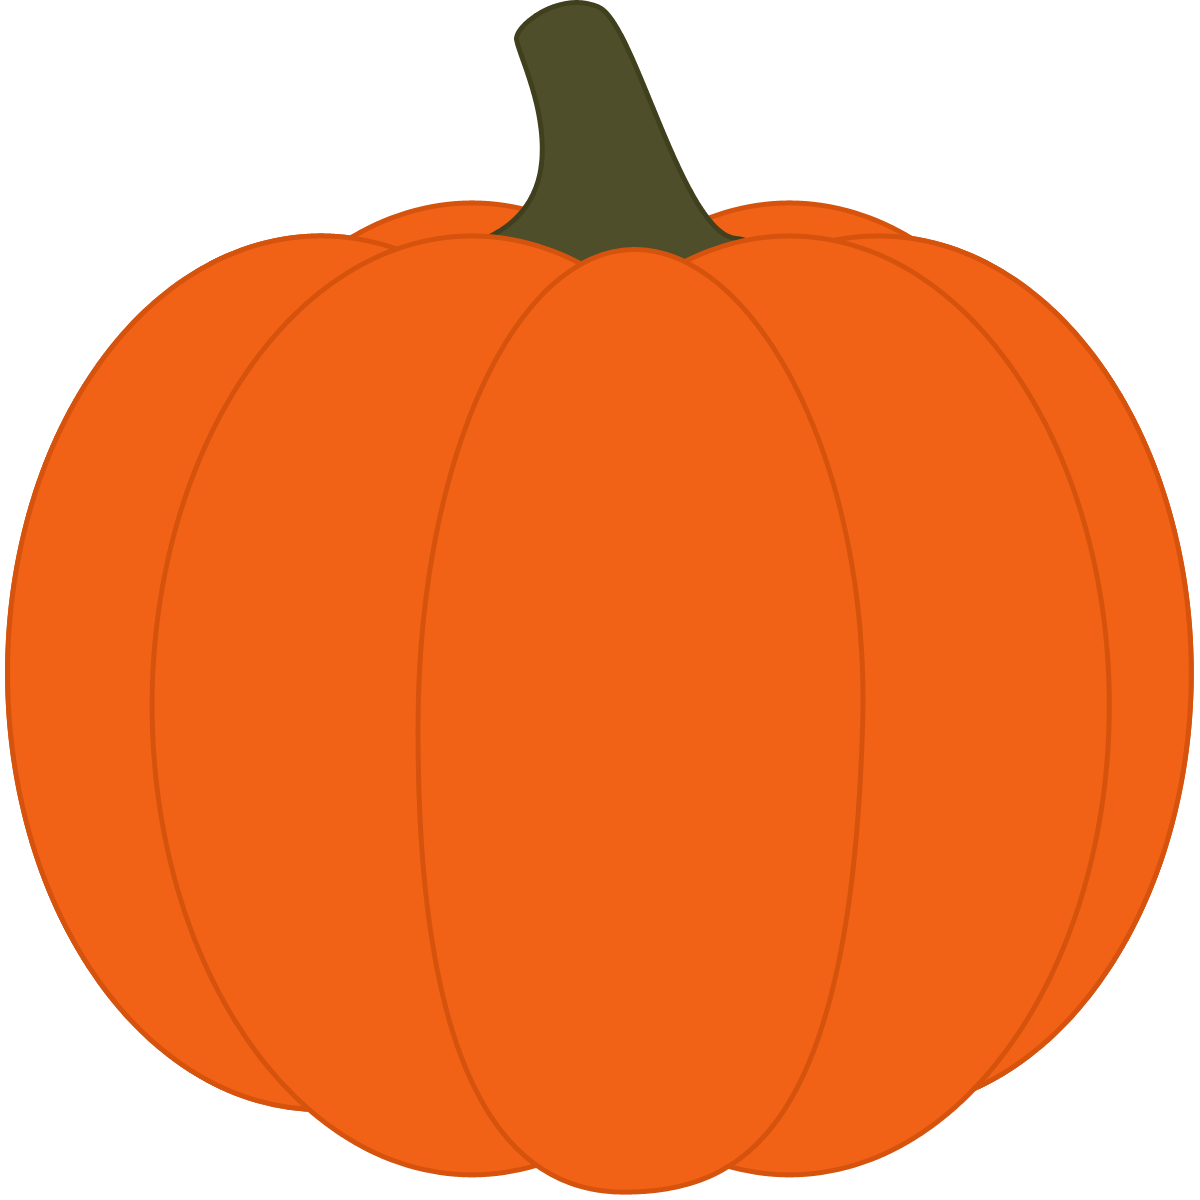 Cute Pumpkin Clipart Png.